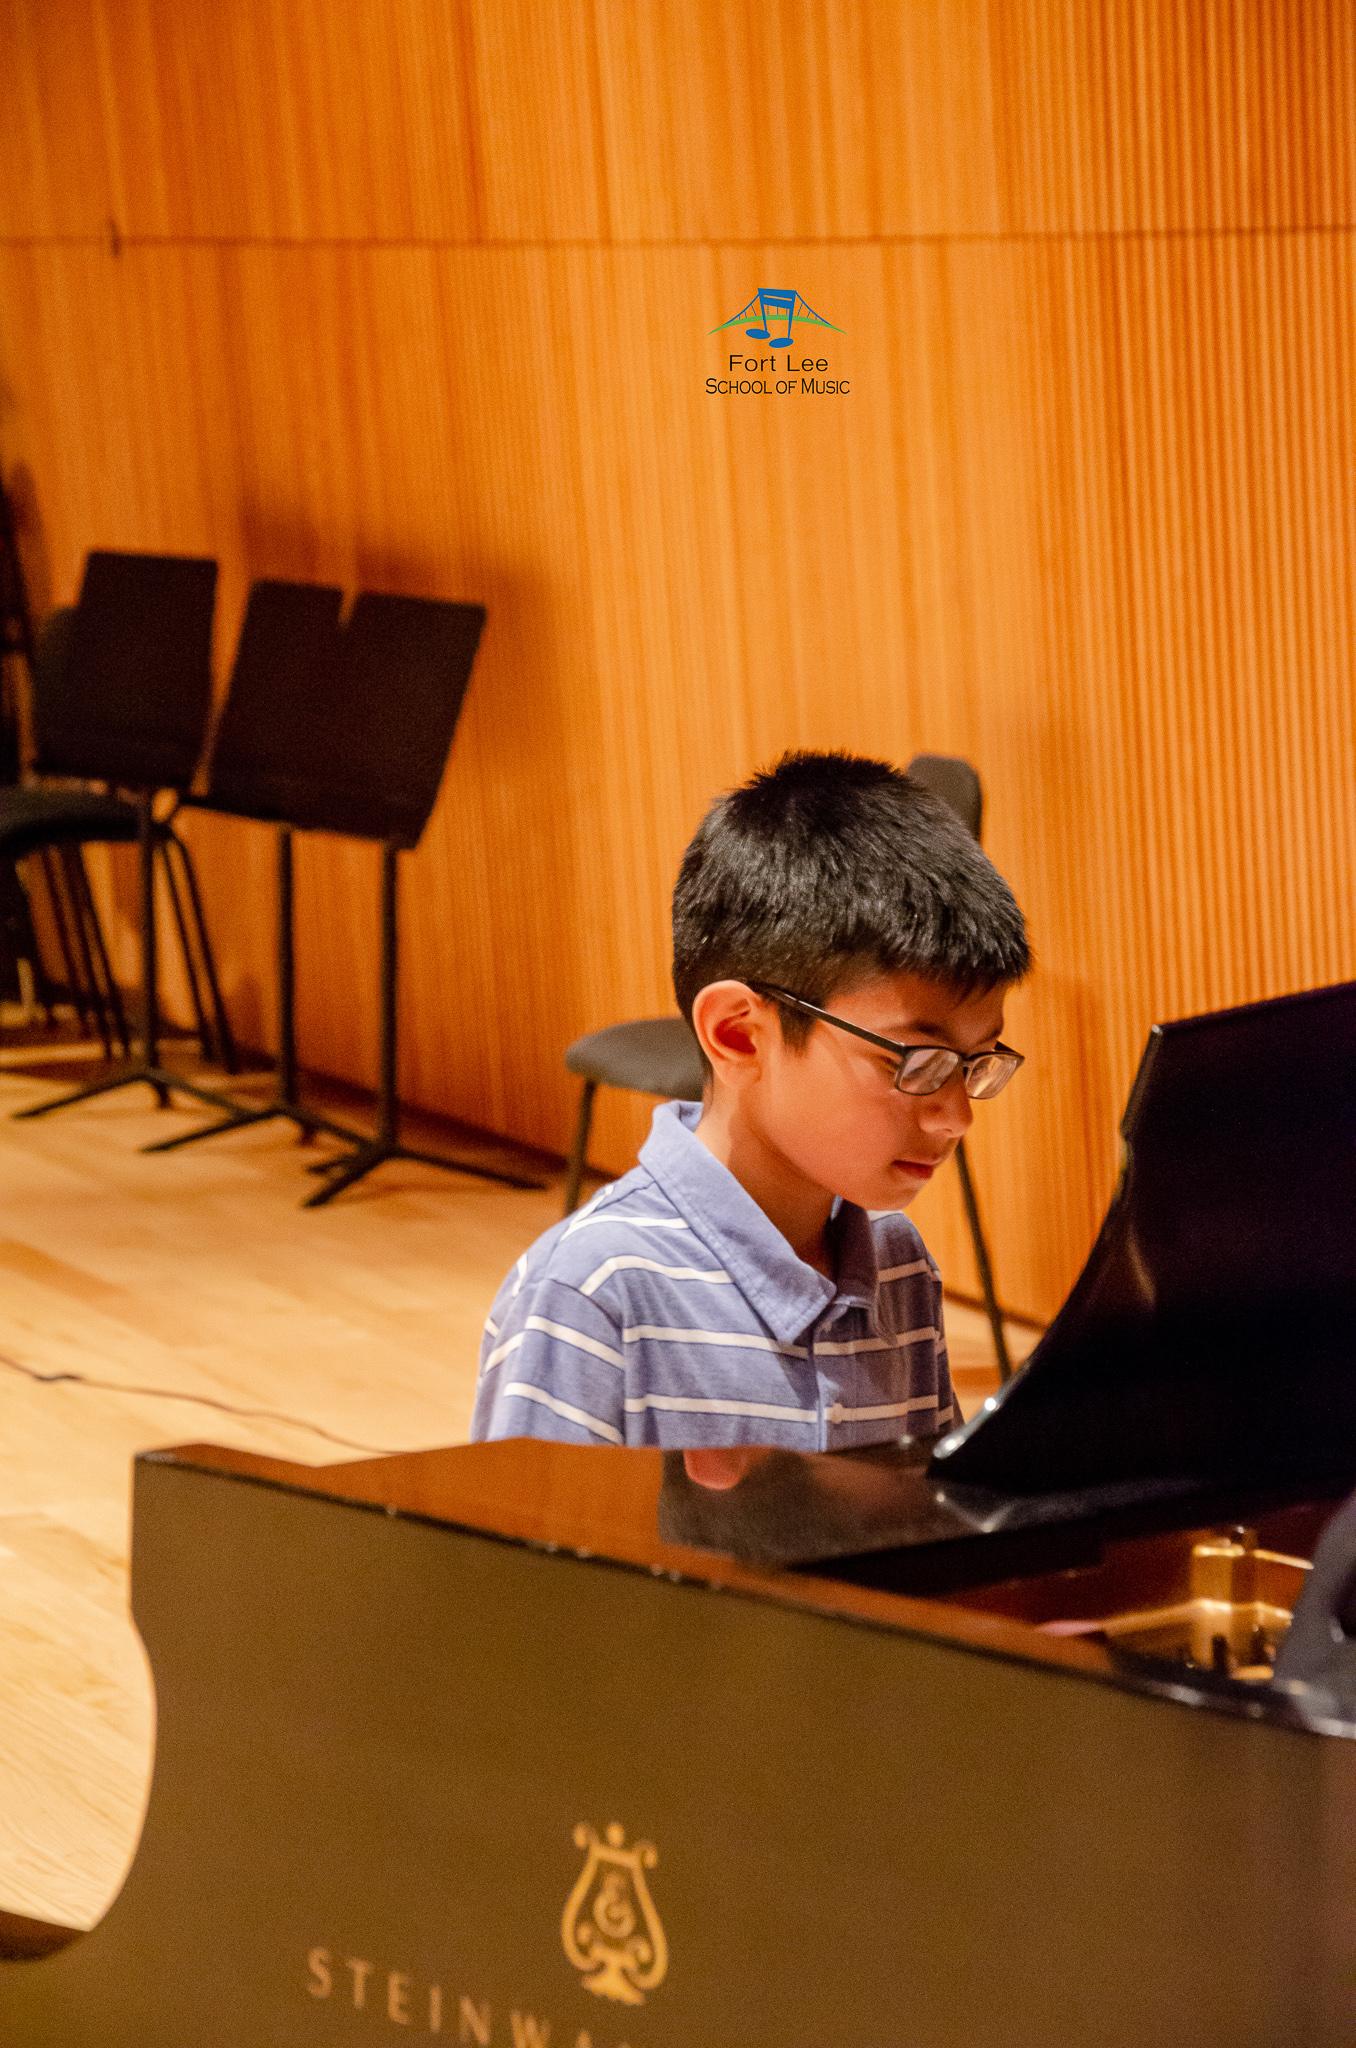 fun-music-schools-for-kids.jpg